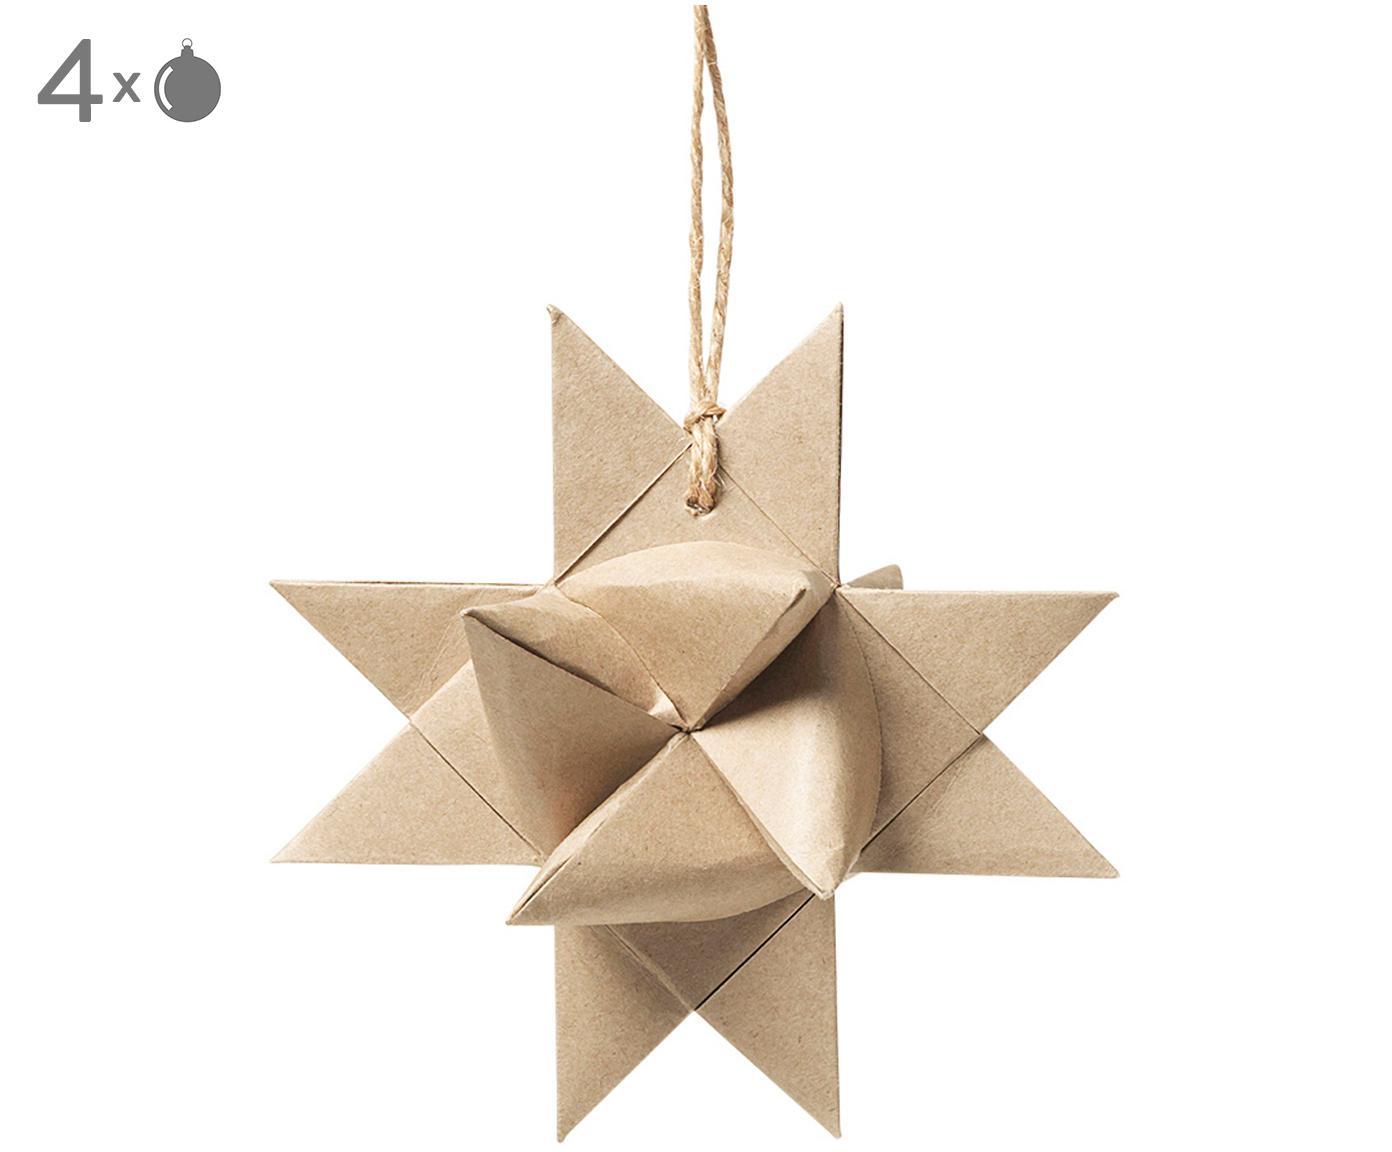 Ciondolo Star Origami, 4 pz., Carta, Beige, Larg. 11 x Prof. 11 cm